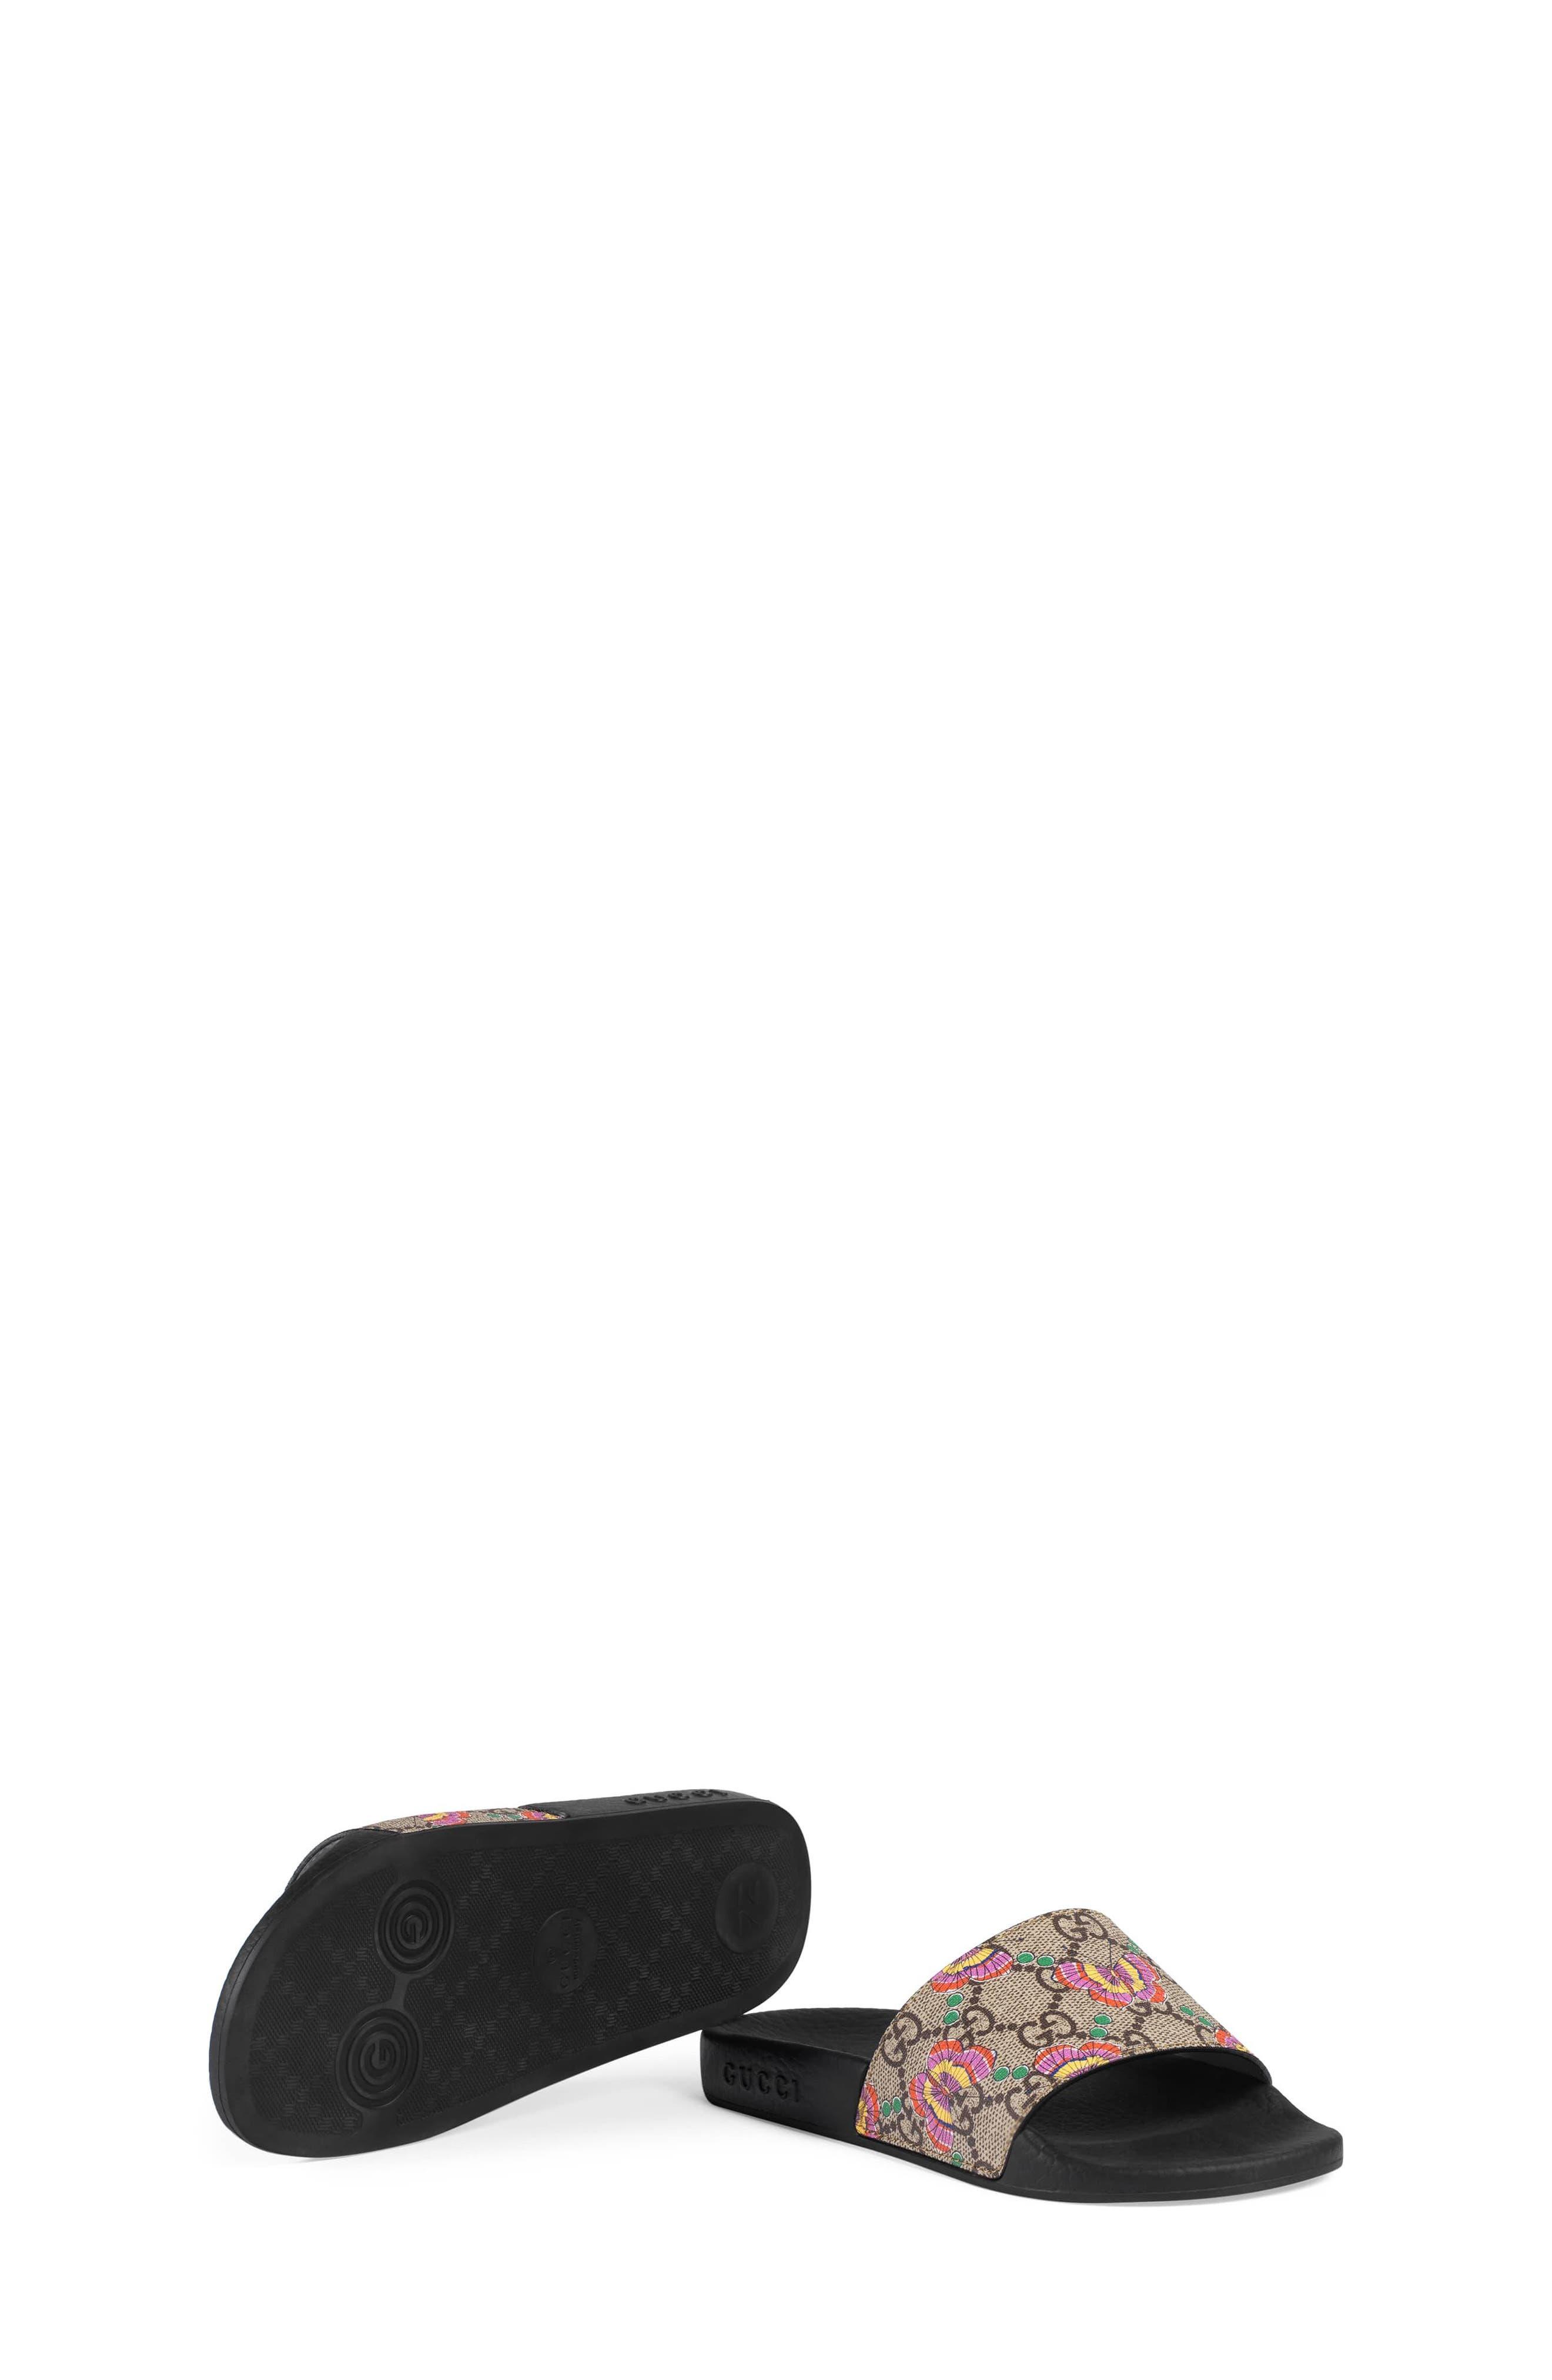 GG Supreme Butterfly Slide Sandal,                             Alternate thumbnail 5, color,                             Beige/ Pink Multi